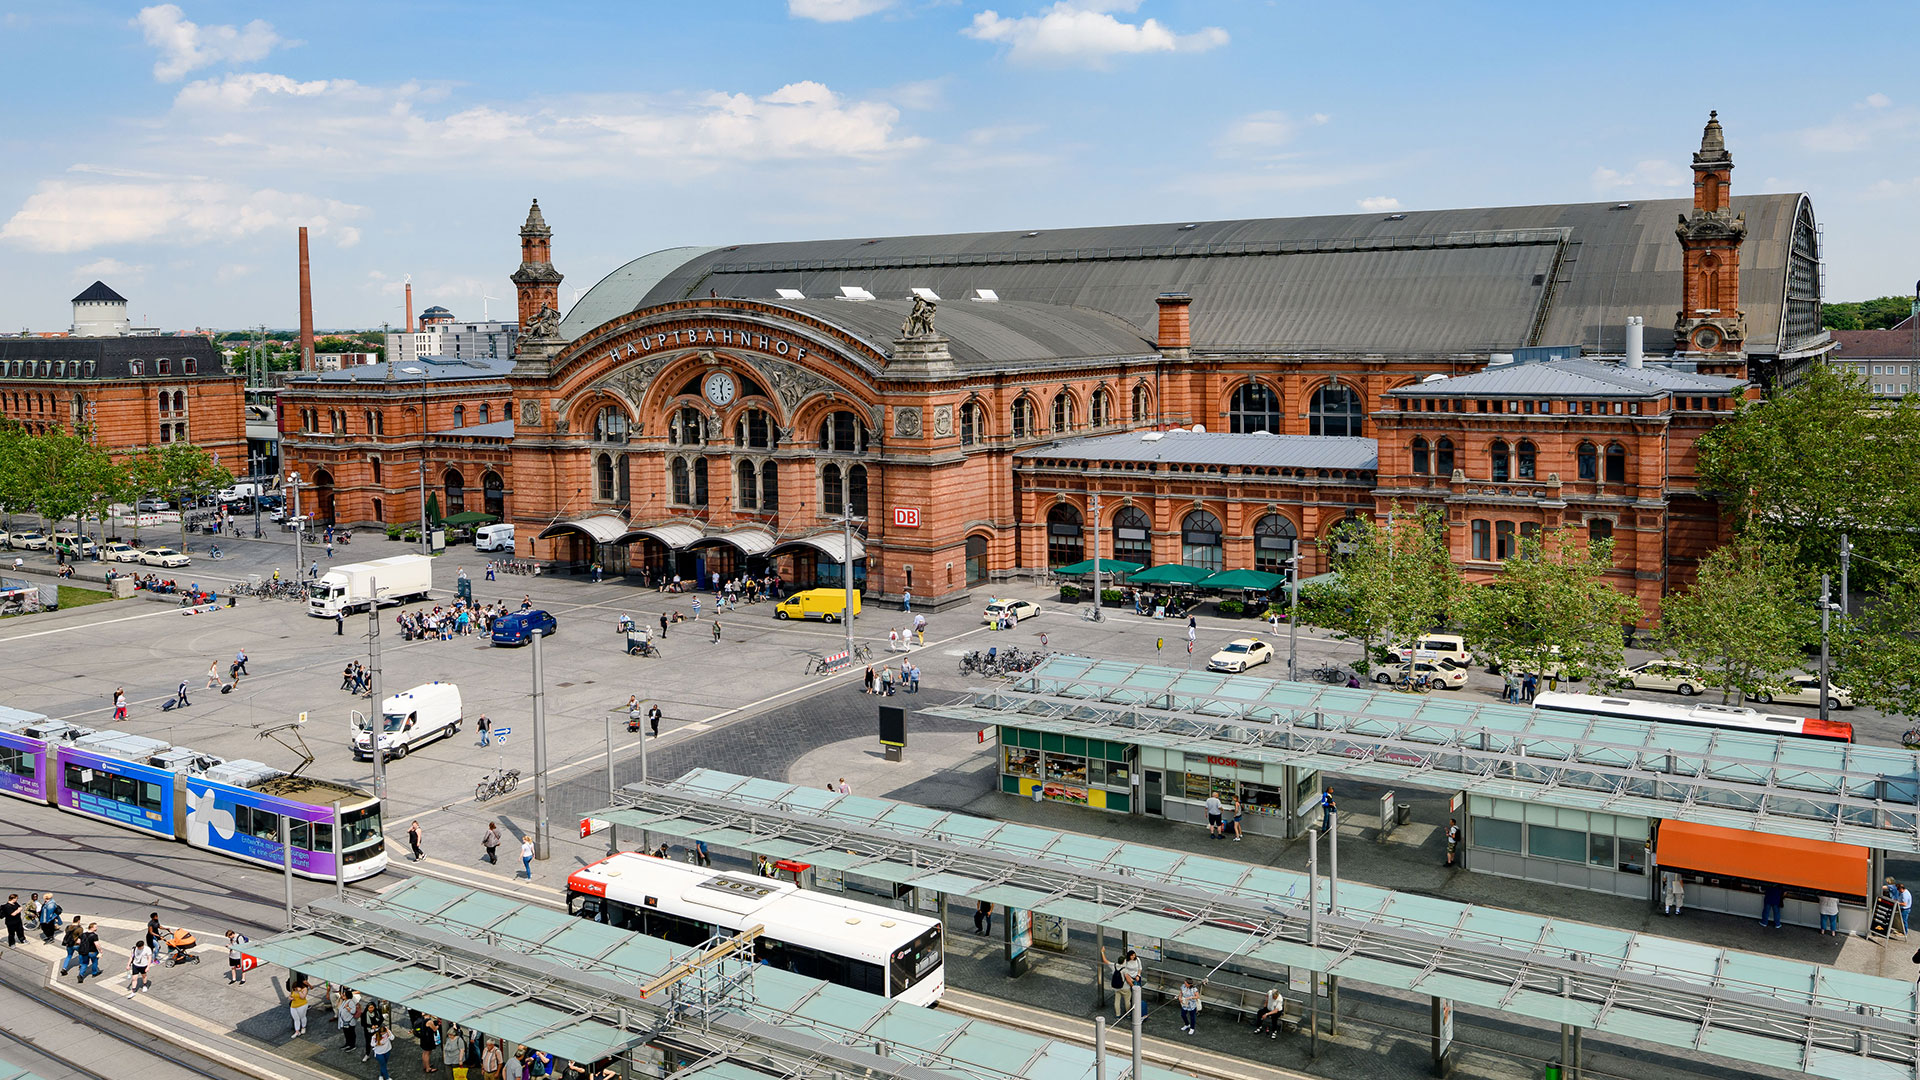 Près de la gare centrale de Brême - Aparthotel Adagio Bremen